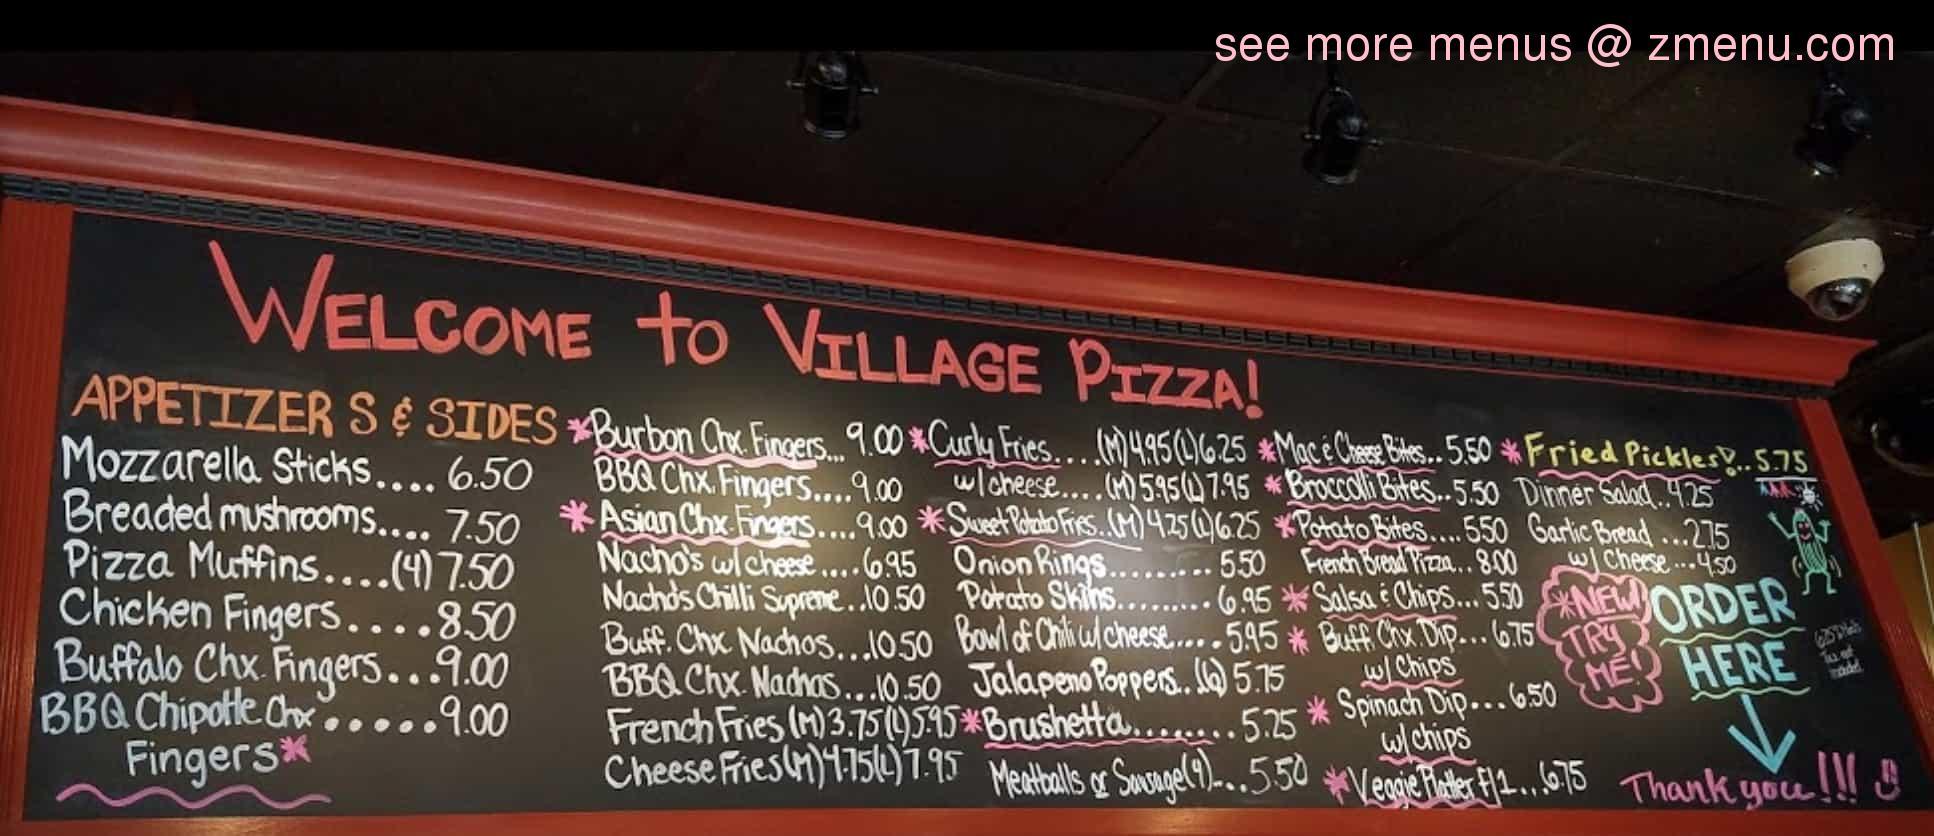 Online Menu Of Village Pizza Restaurant North Adams Massachusetts 01247 Zmenu